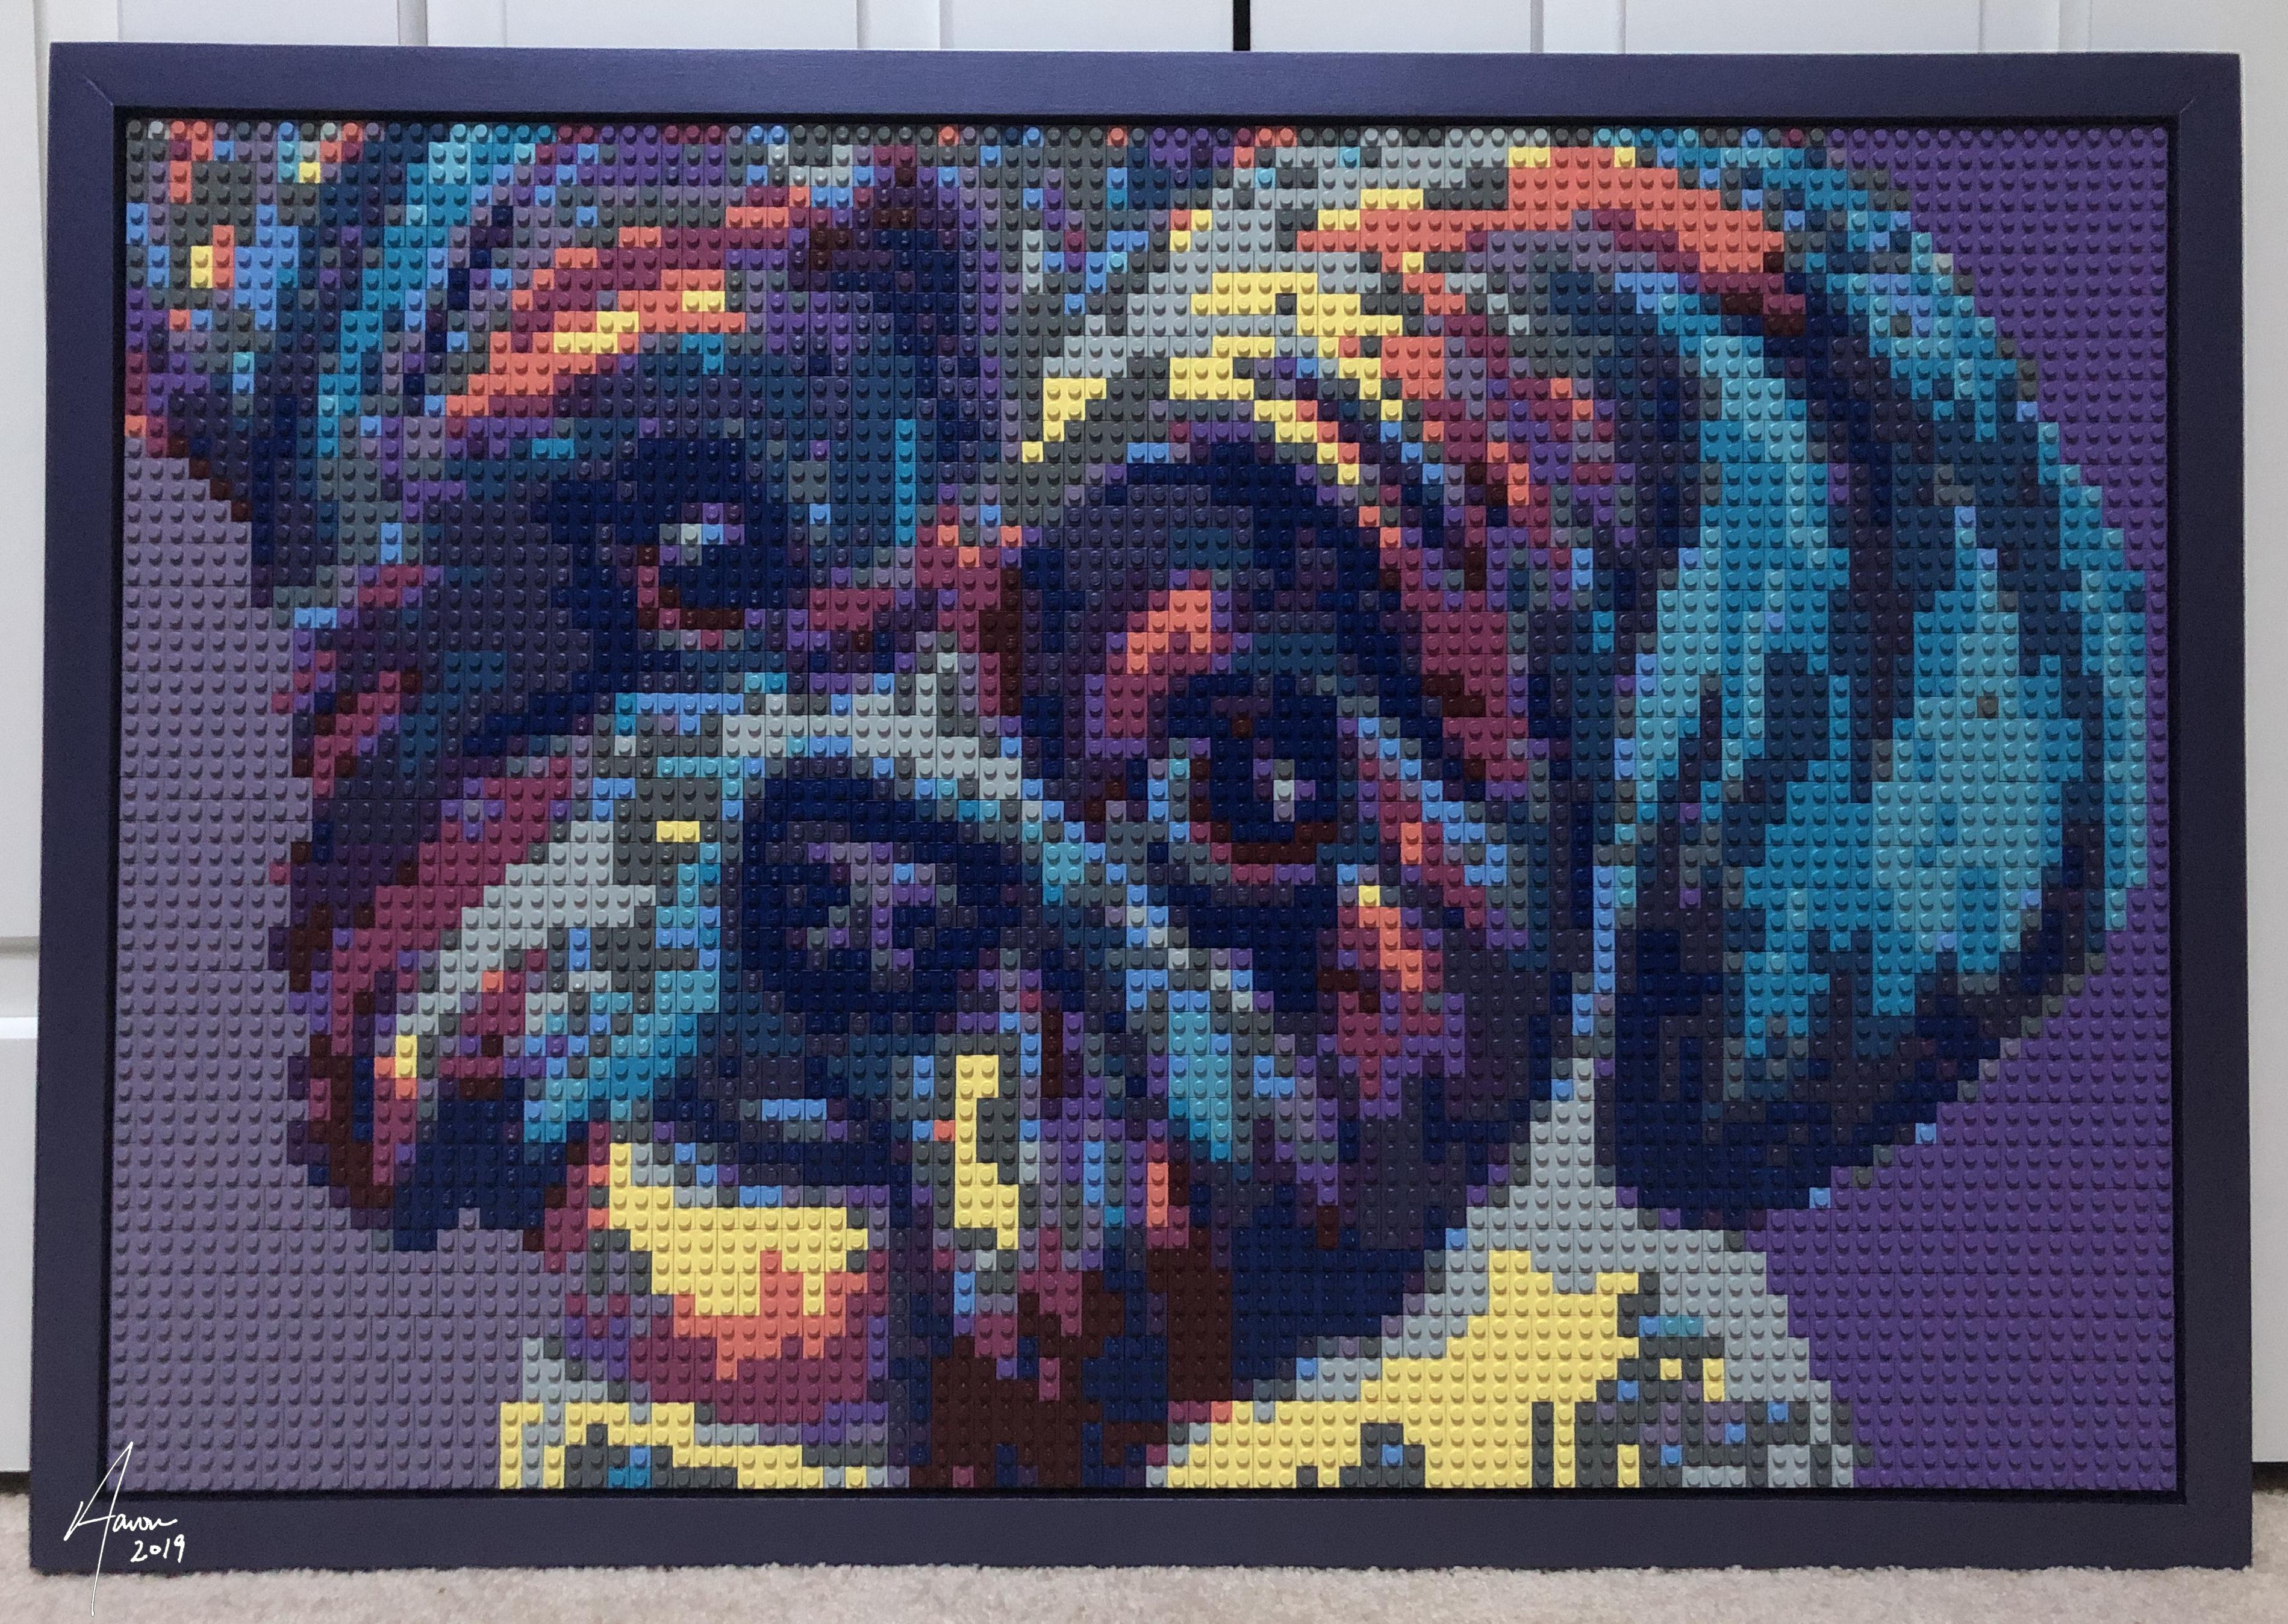 Shih-Tzu LEGO mosaic